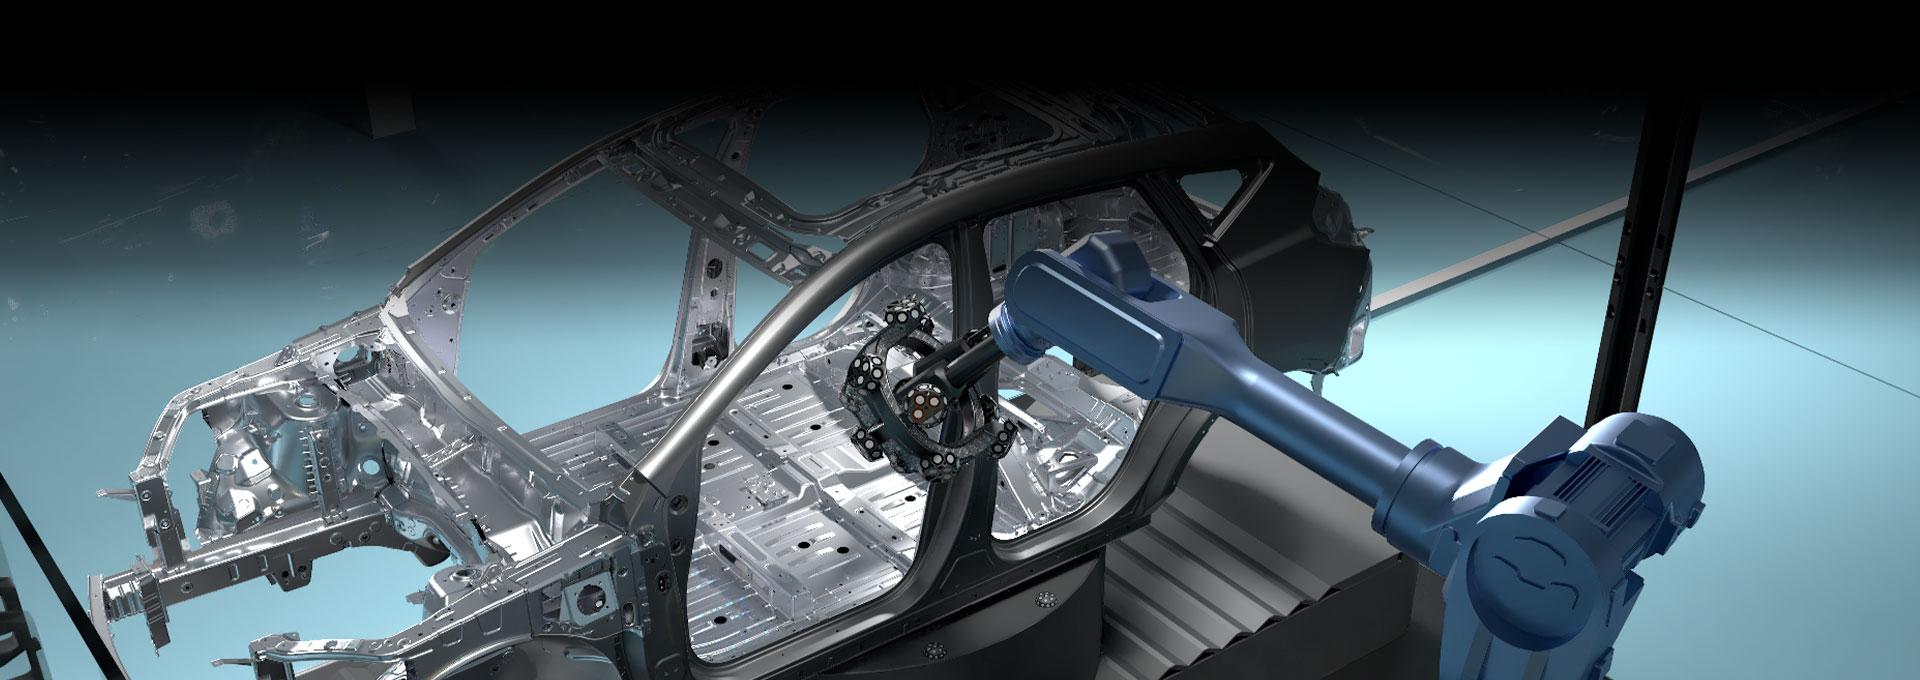 AutoScan-T42 3D Scanner System